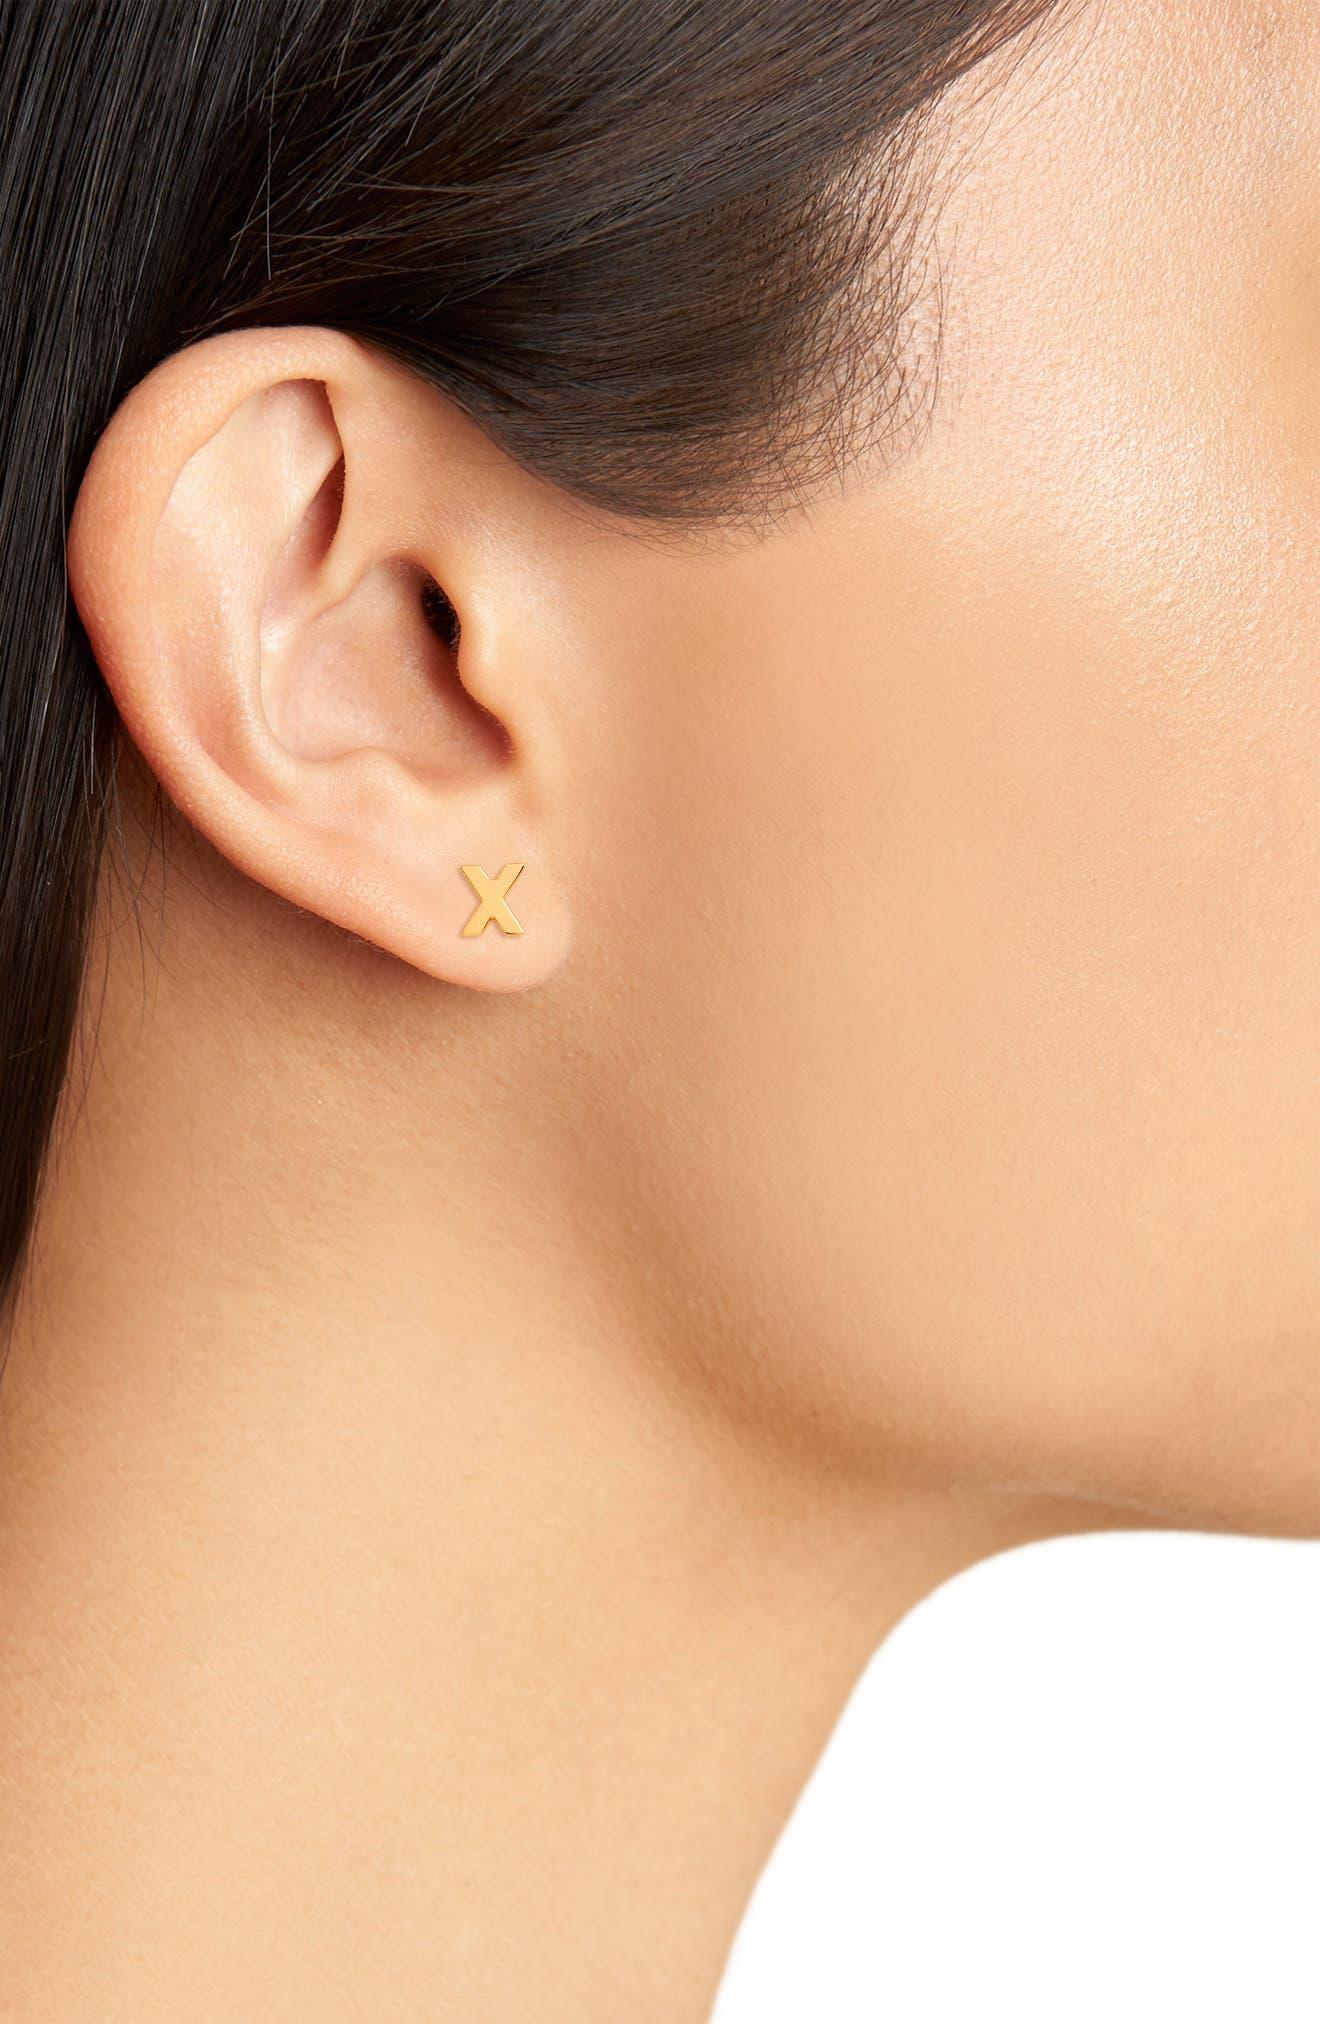 XO Stud Earrings,                             Alternate thumbnail 2, color,                             GOLD